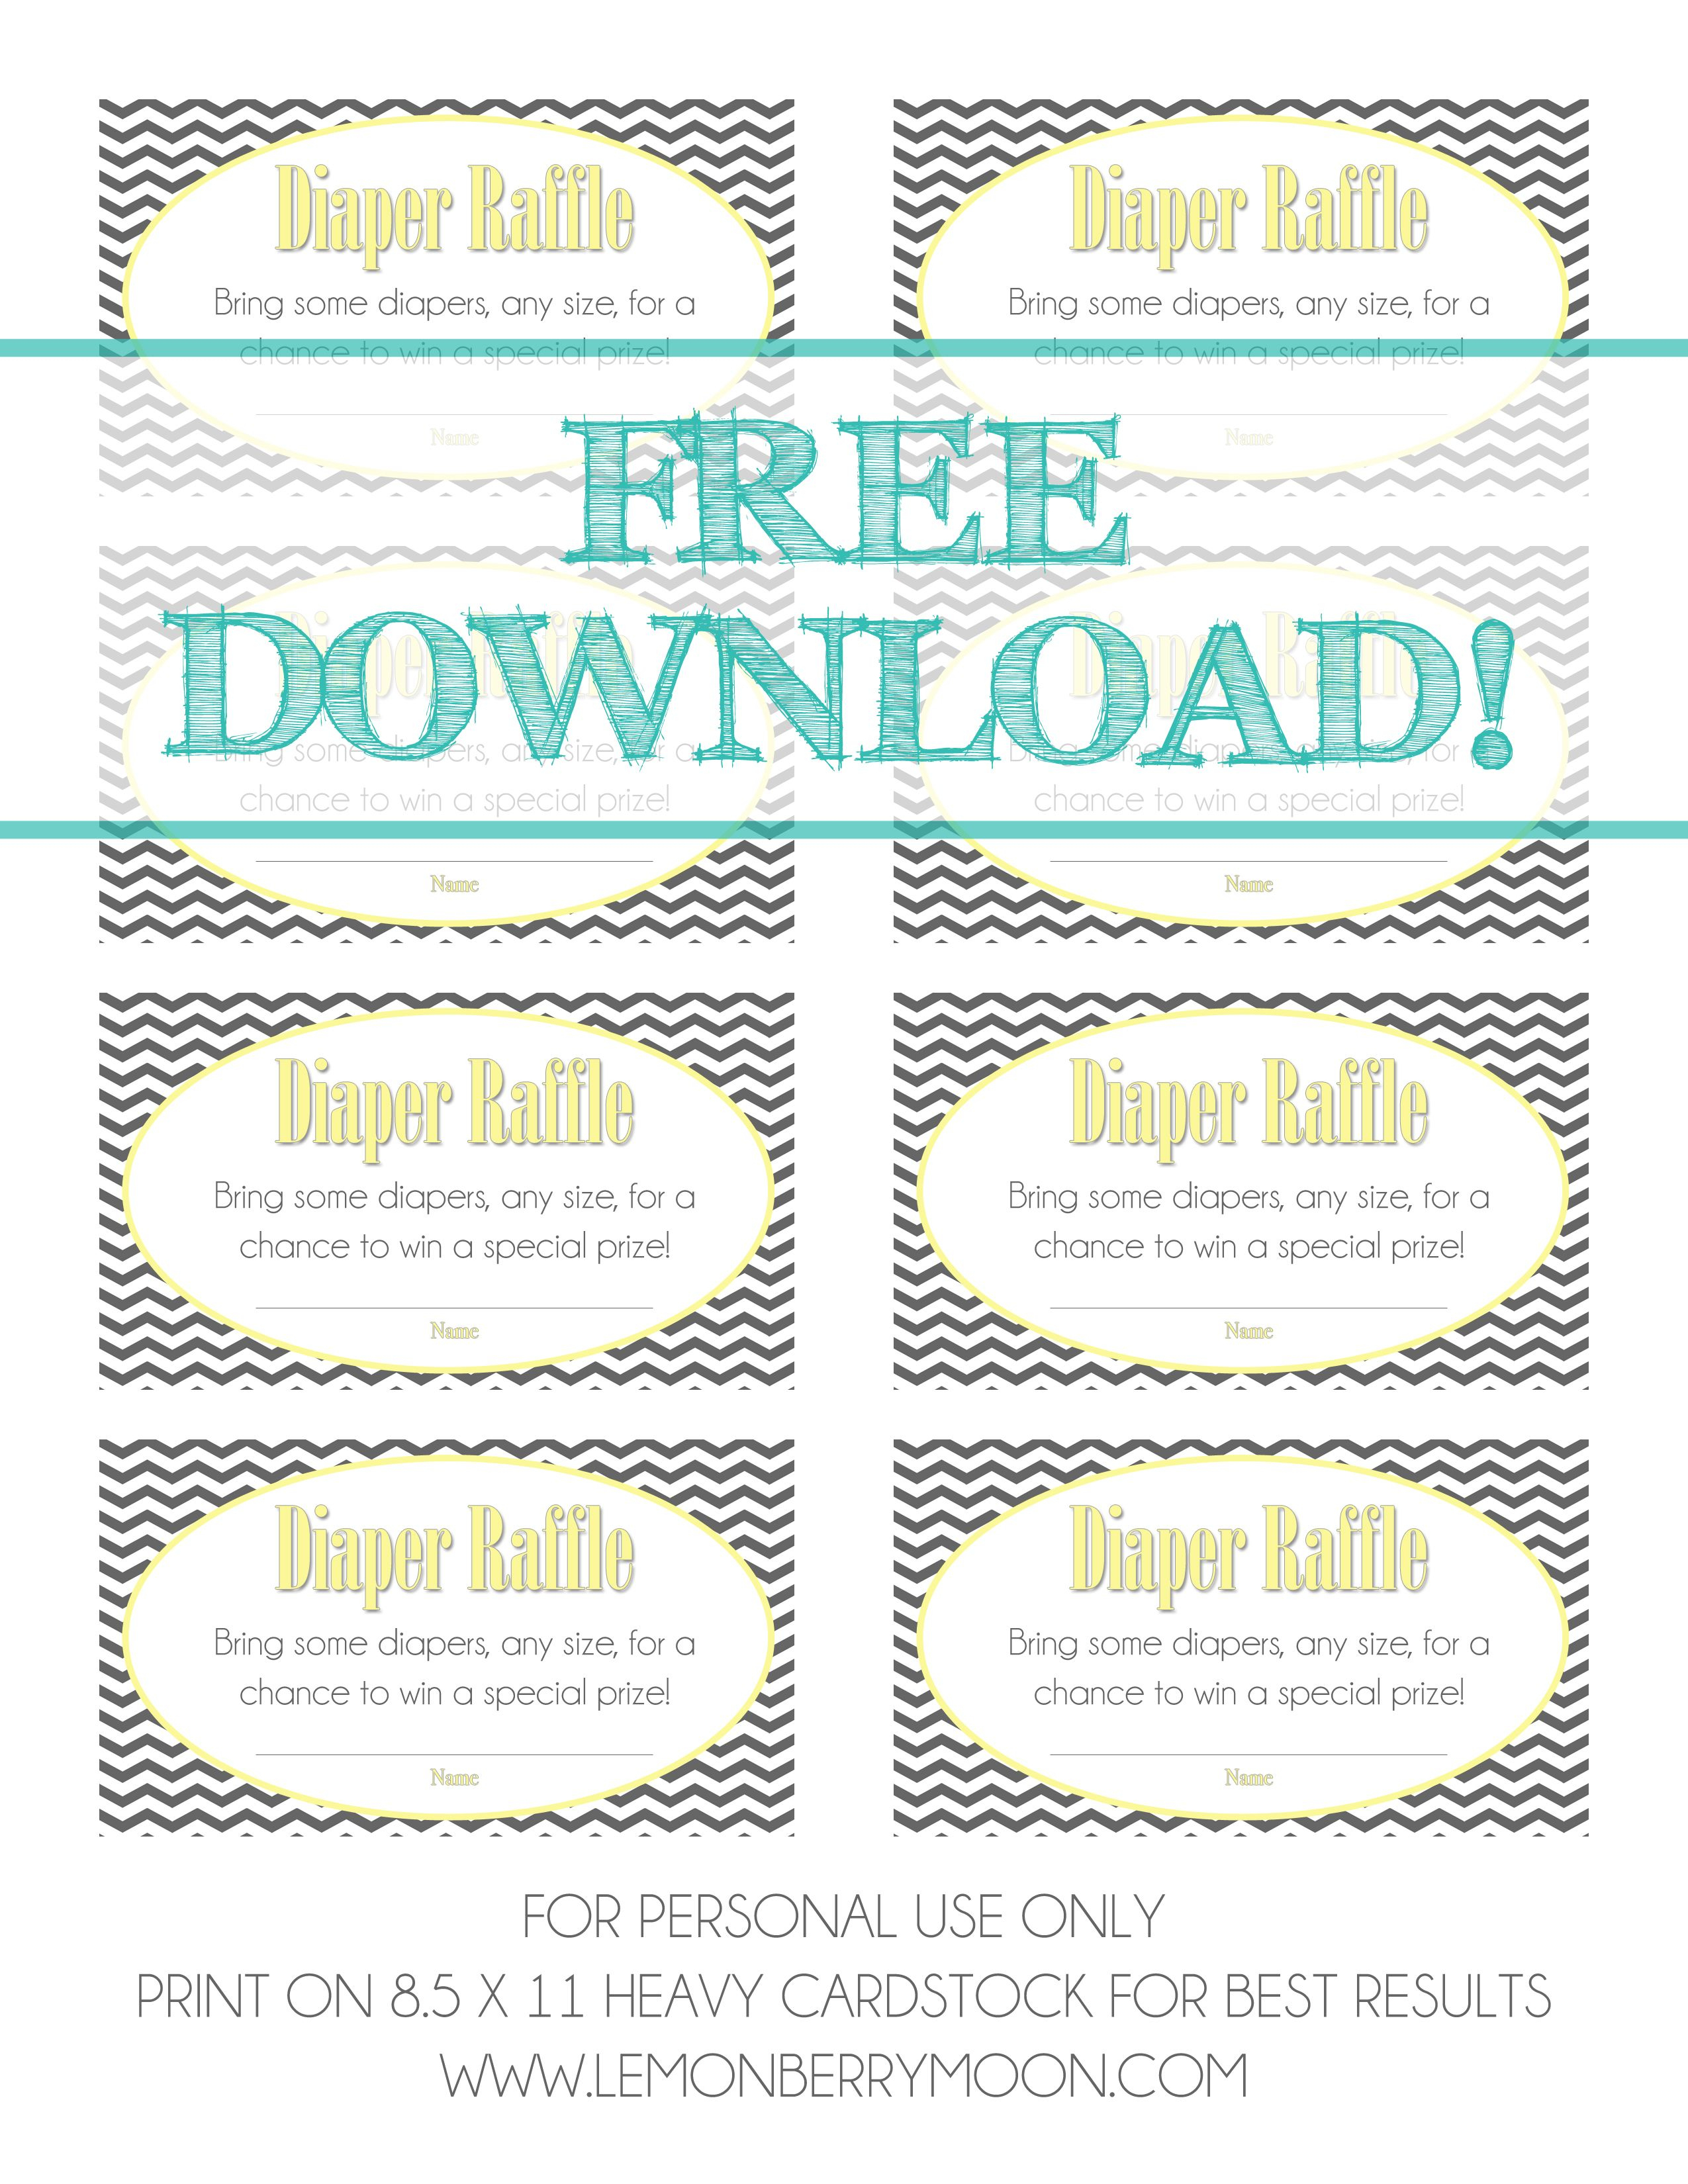 Free Download - Baby Diaper Raffle Template | Baaby Shower | Baby - Diaper Raffle Template Free Printable